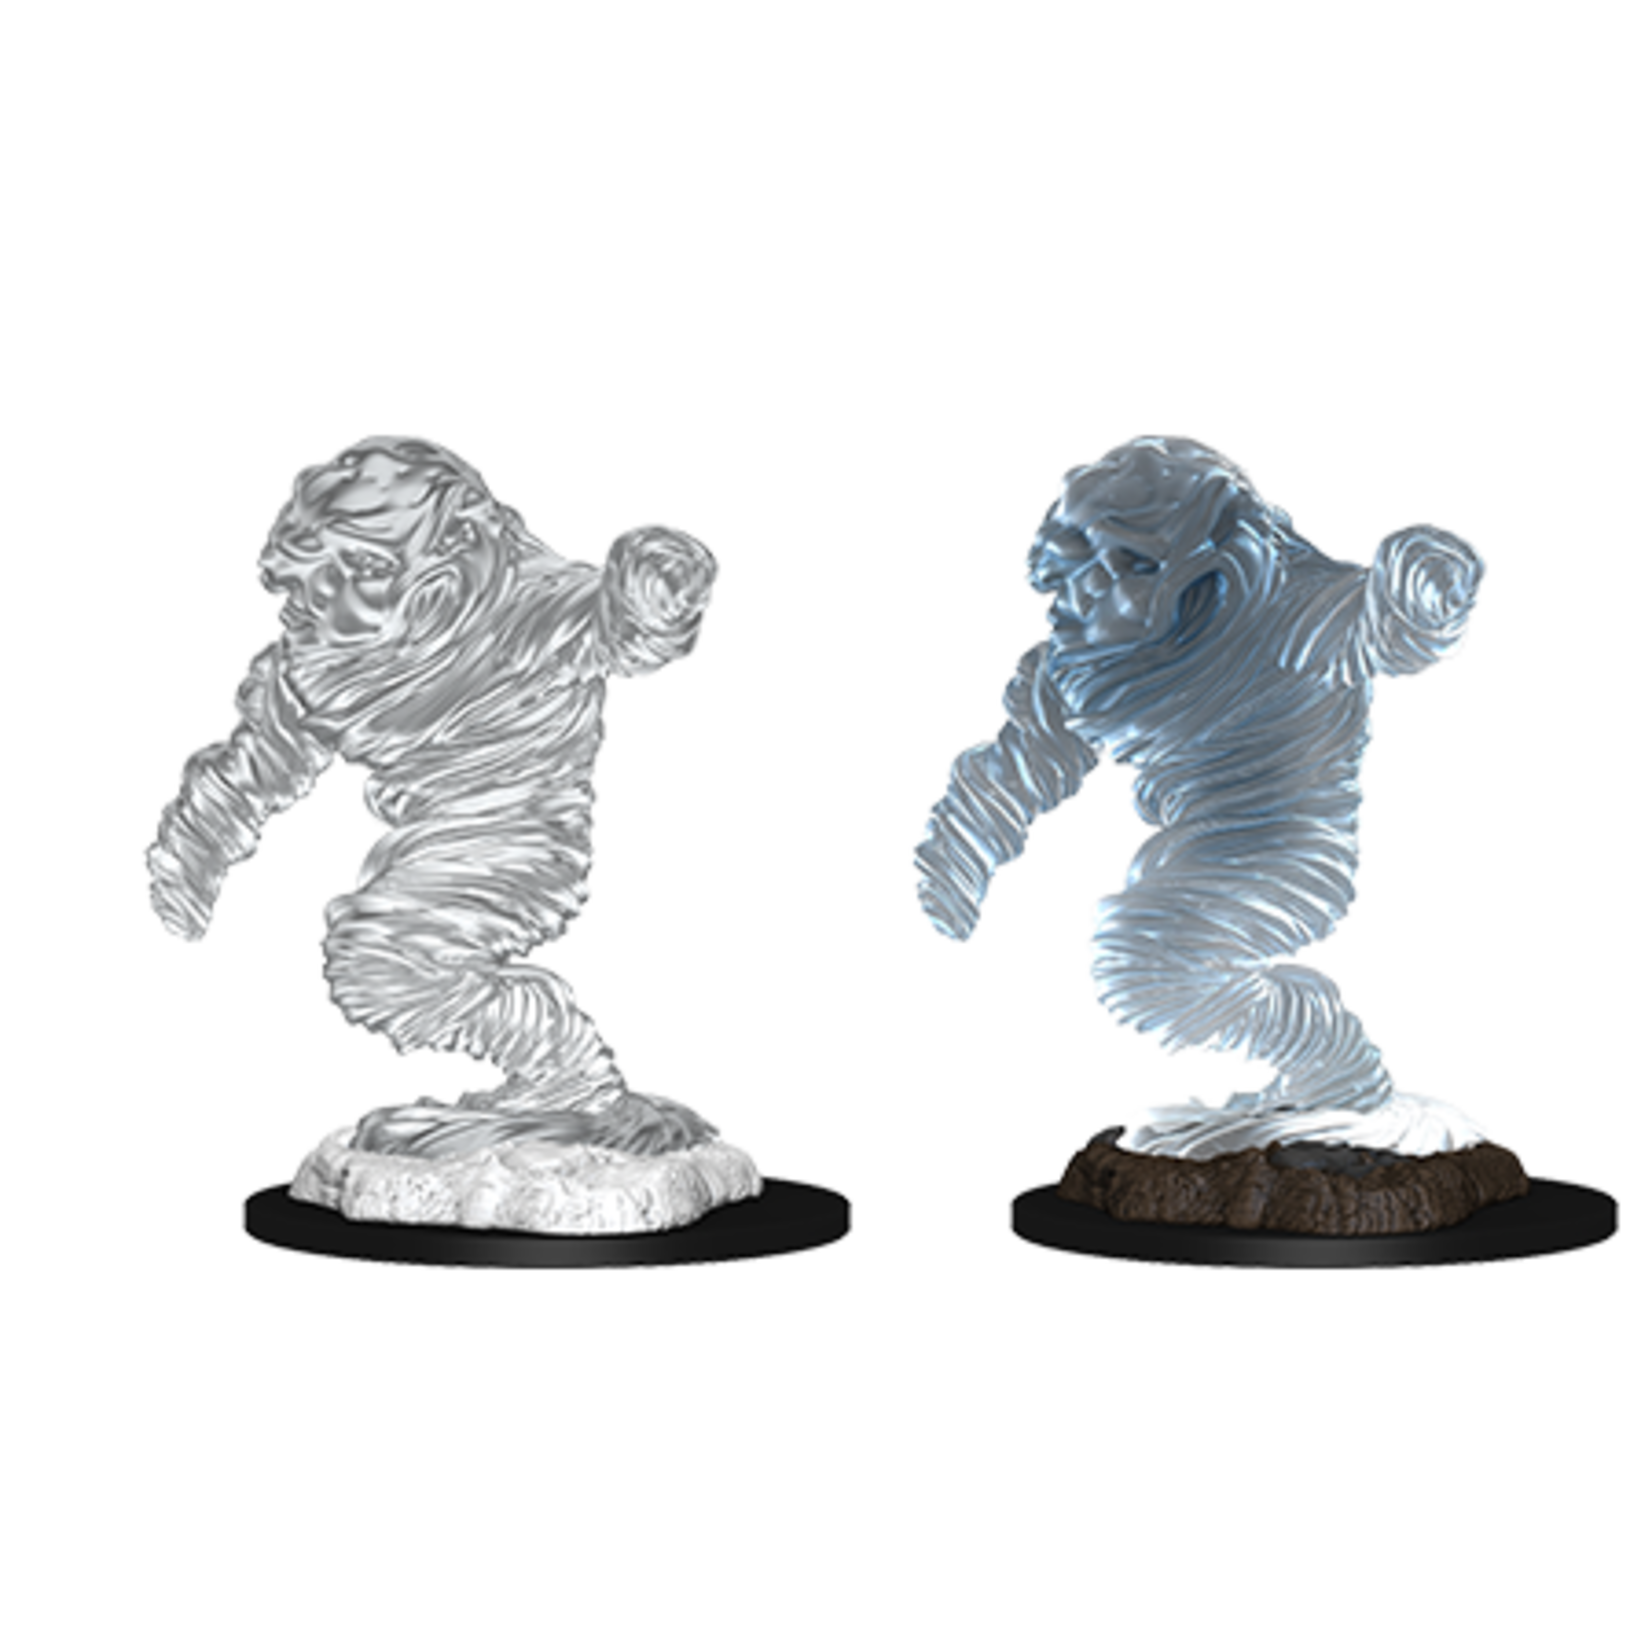 WizKids D&D Minis: Wave 12.5 - Air Elemental